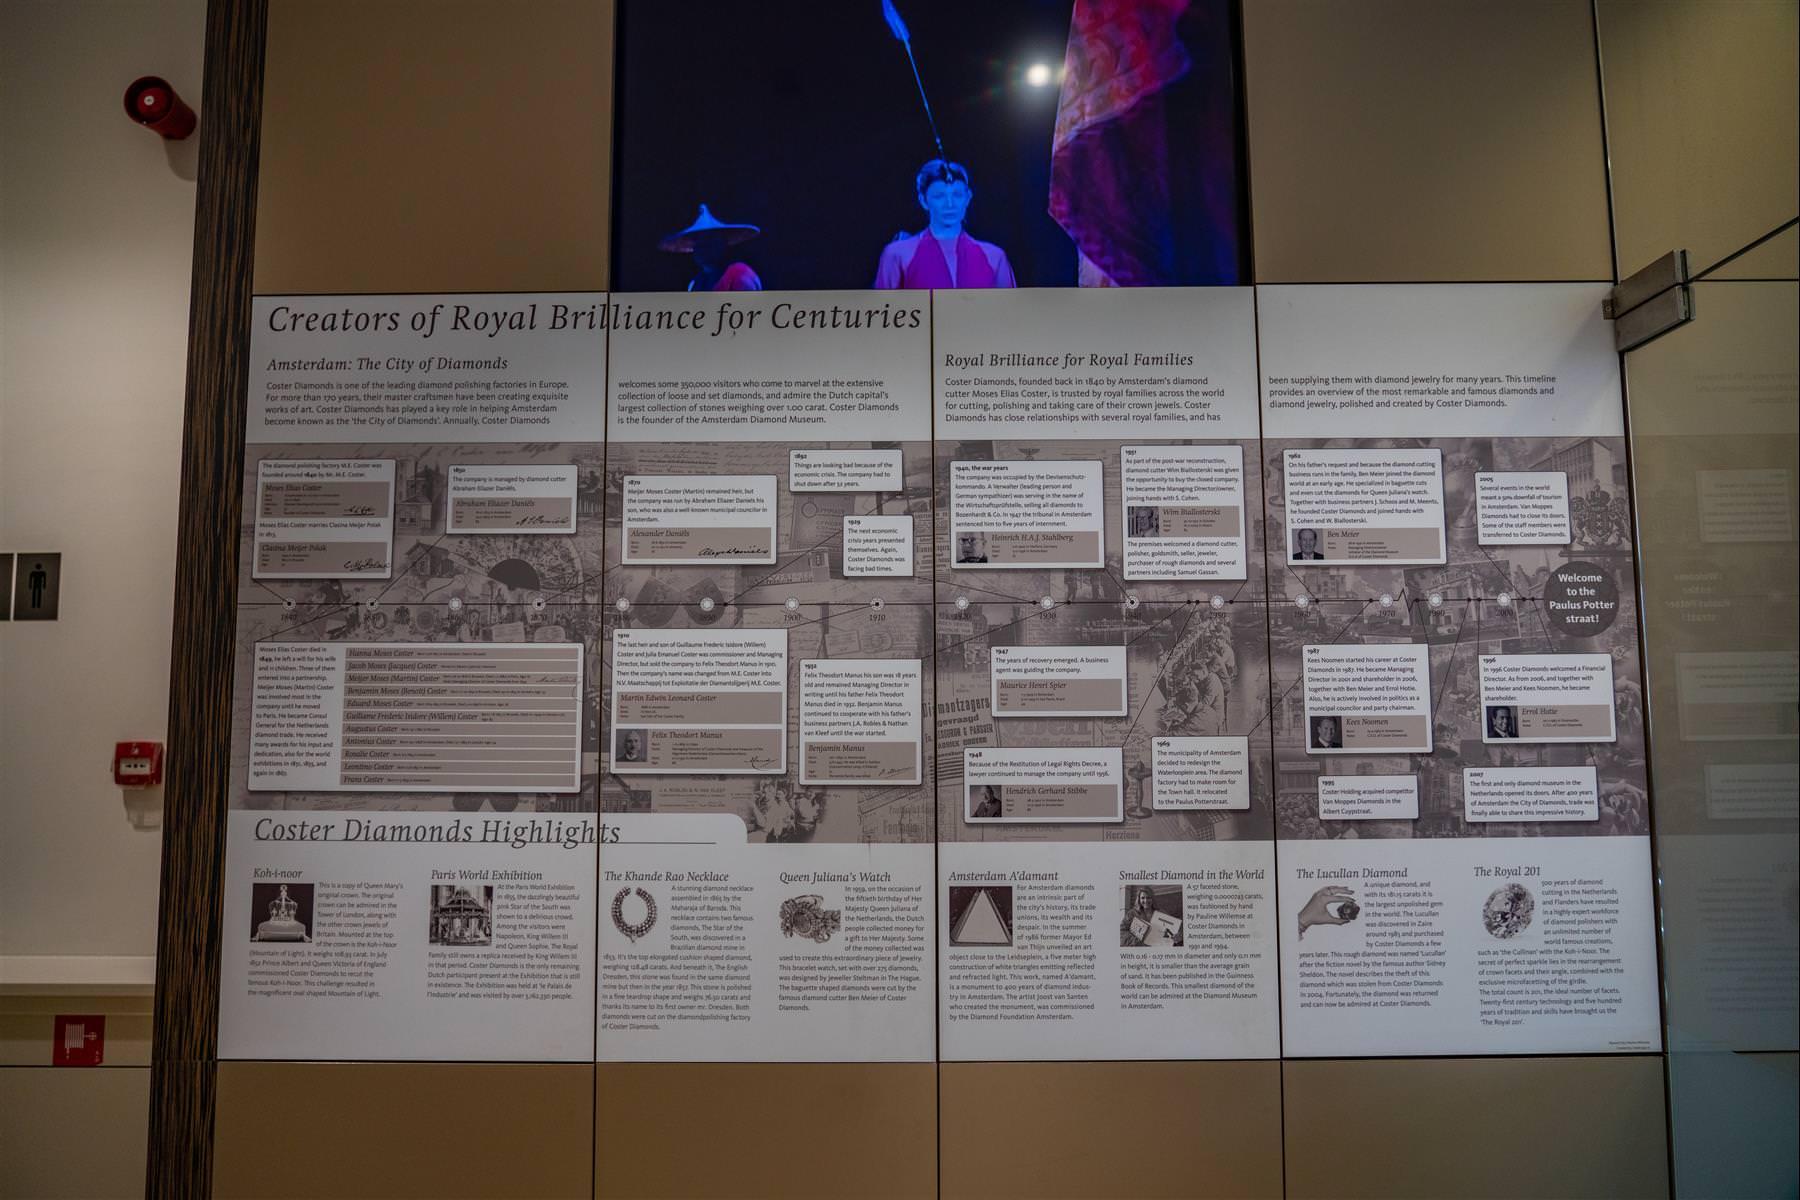 鑽石博物館